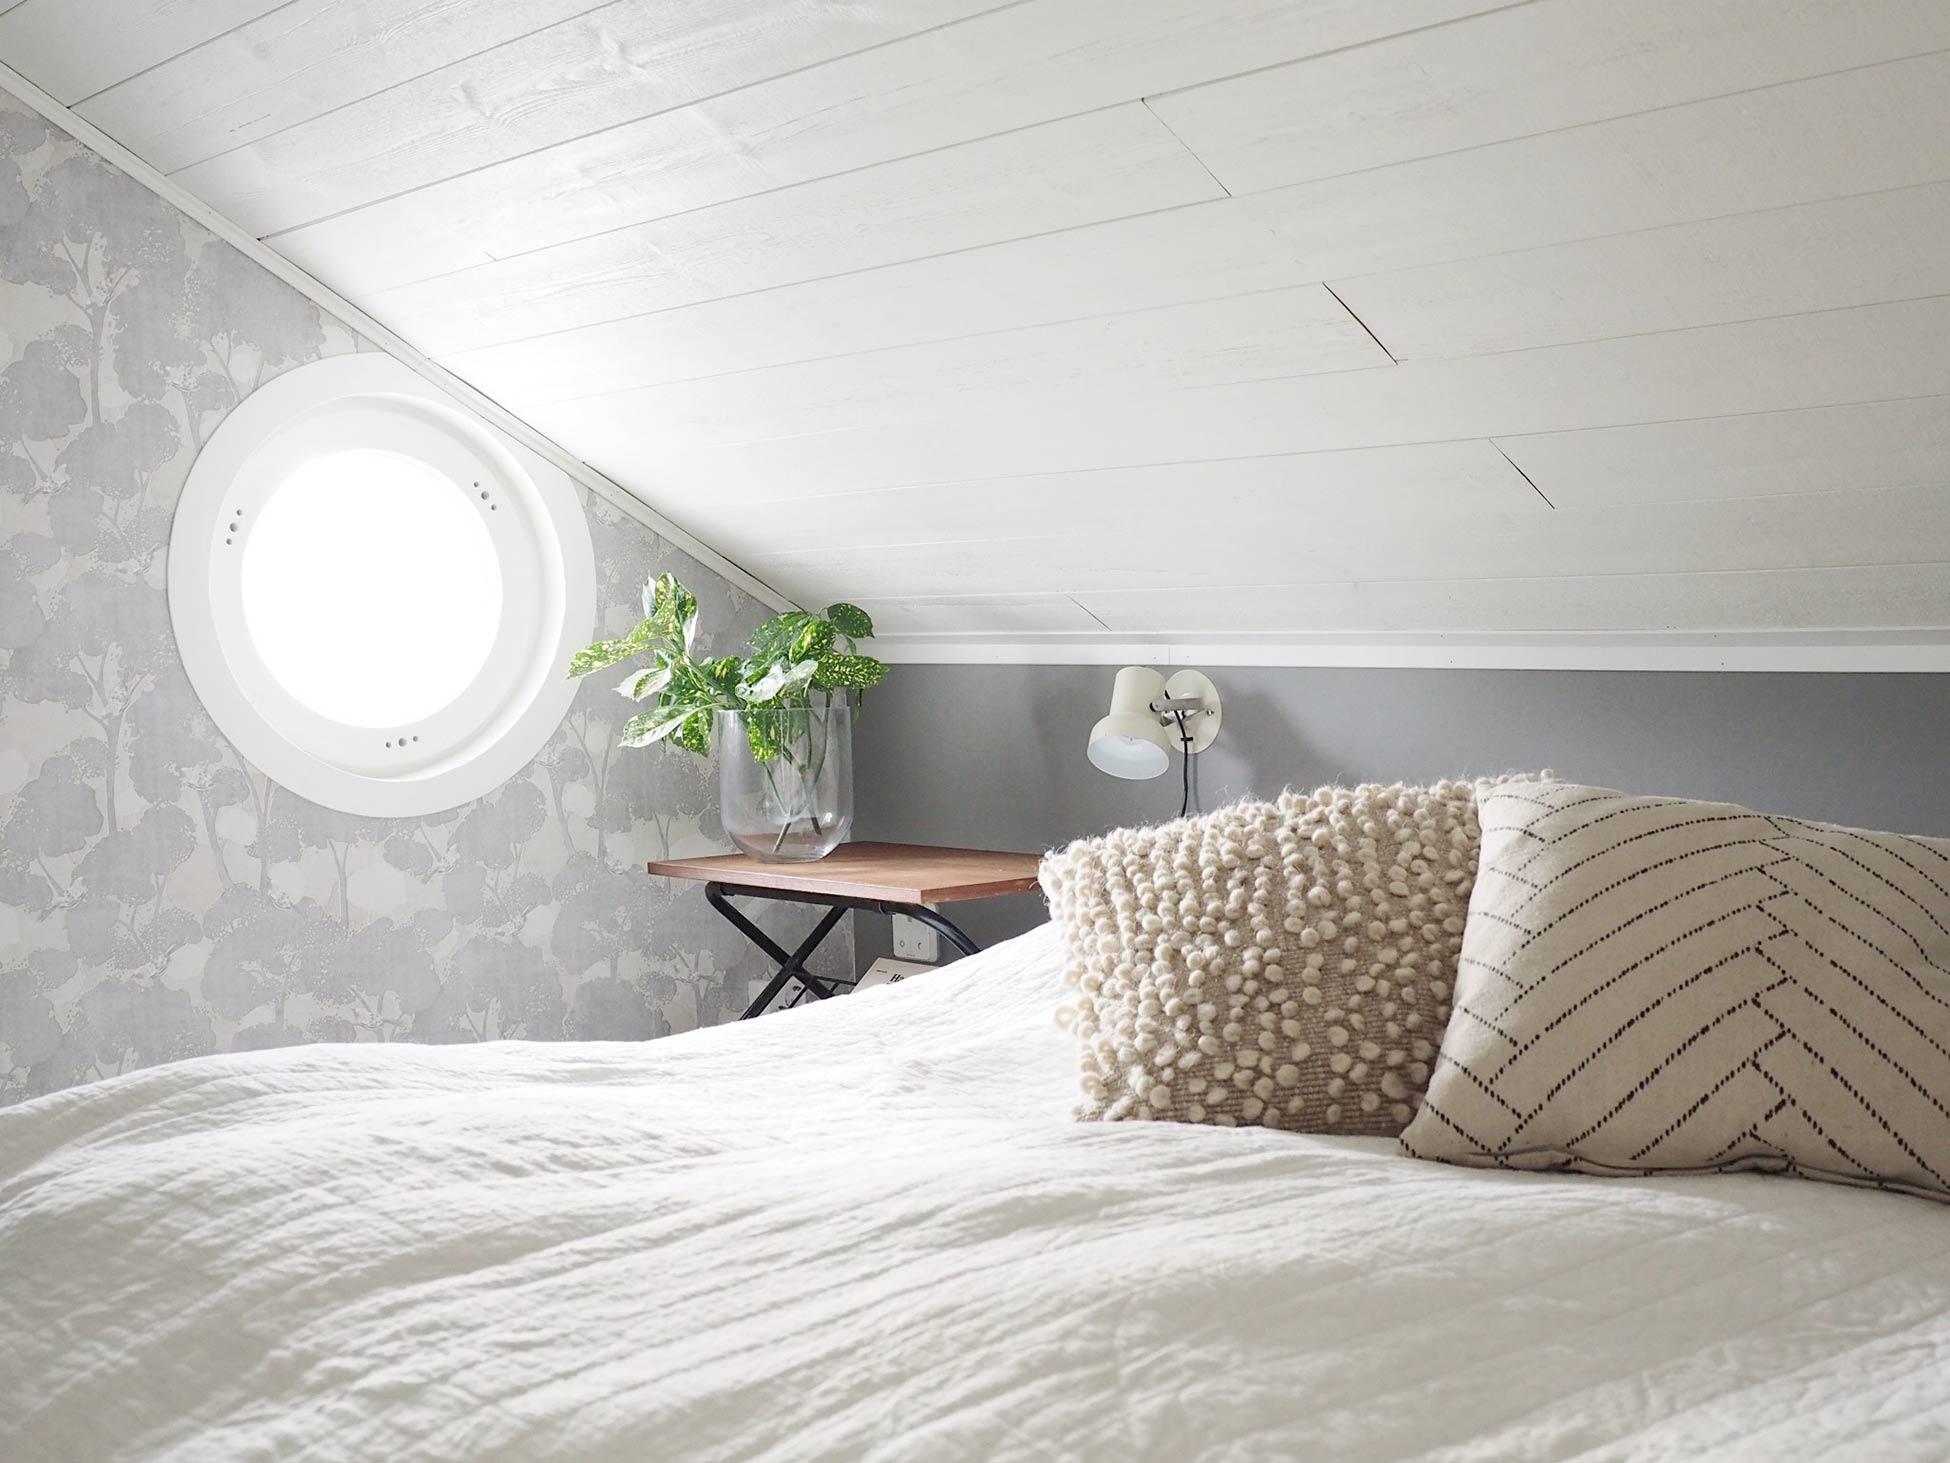 Pilke-Interior pintamateriaalisuunnittelu